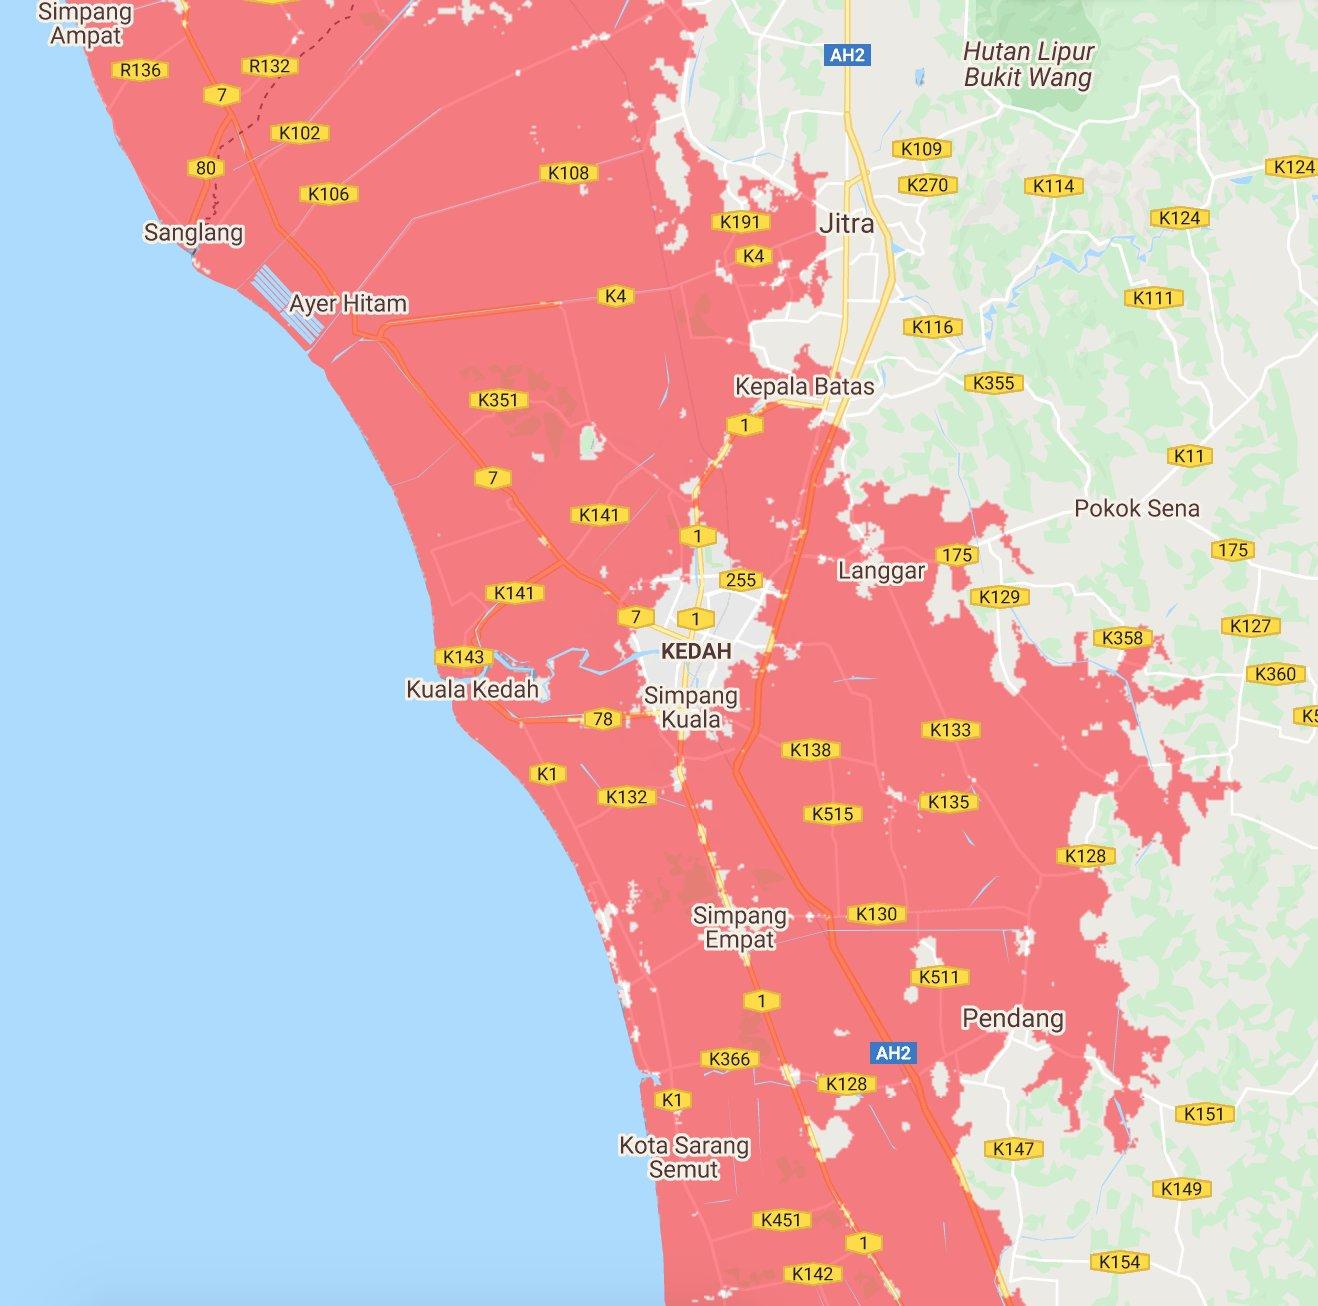 10 Bandar Utama Malaysia Tenggelam Menjelang 2050